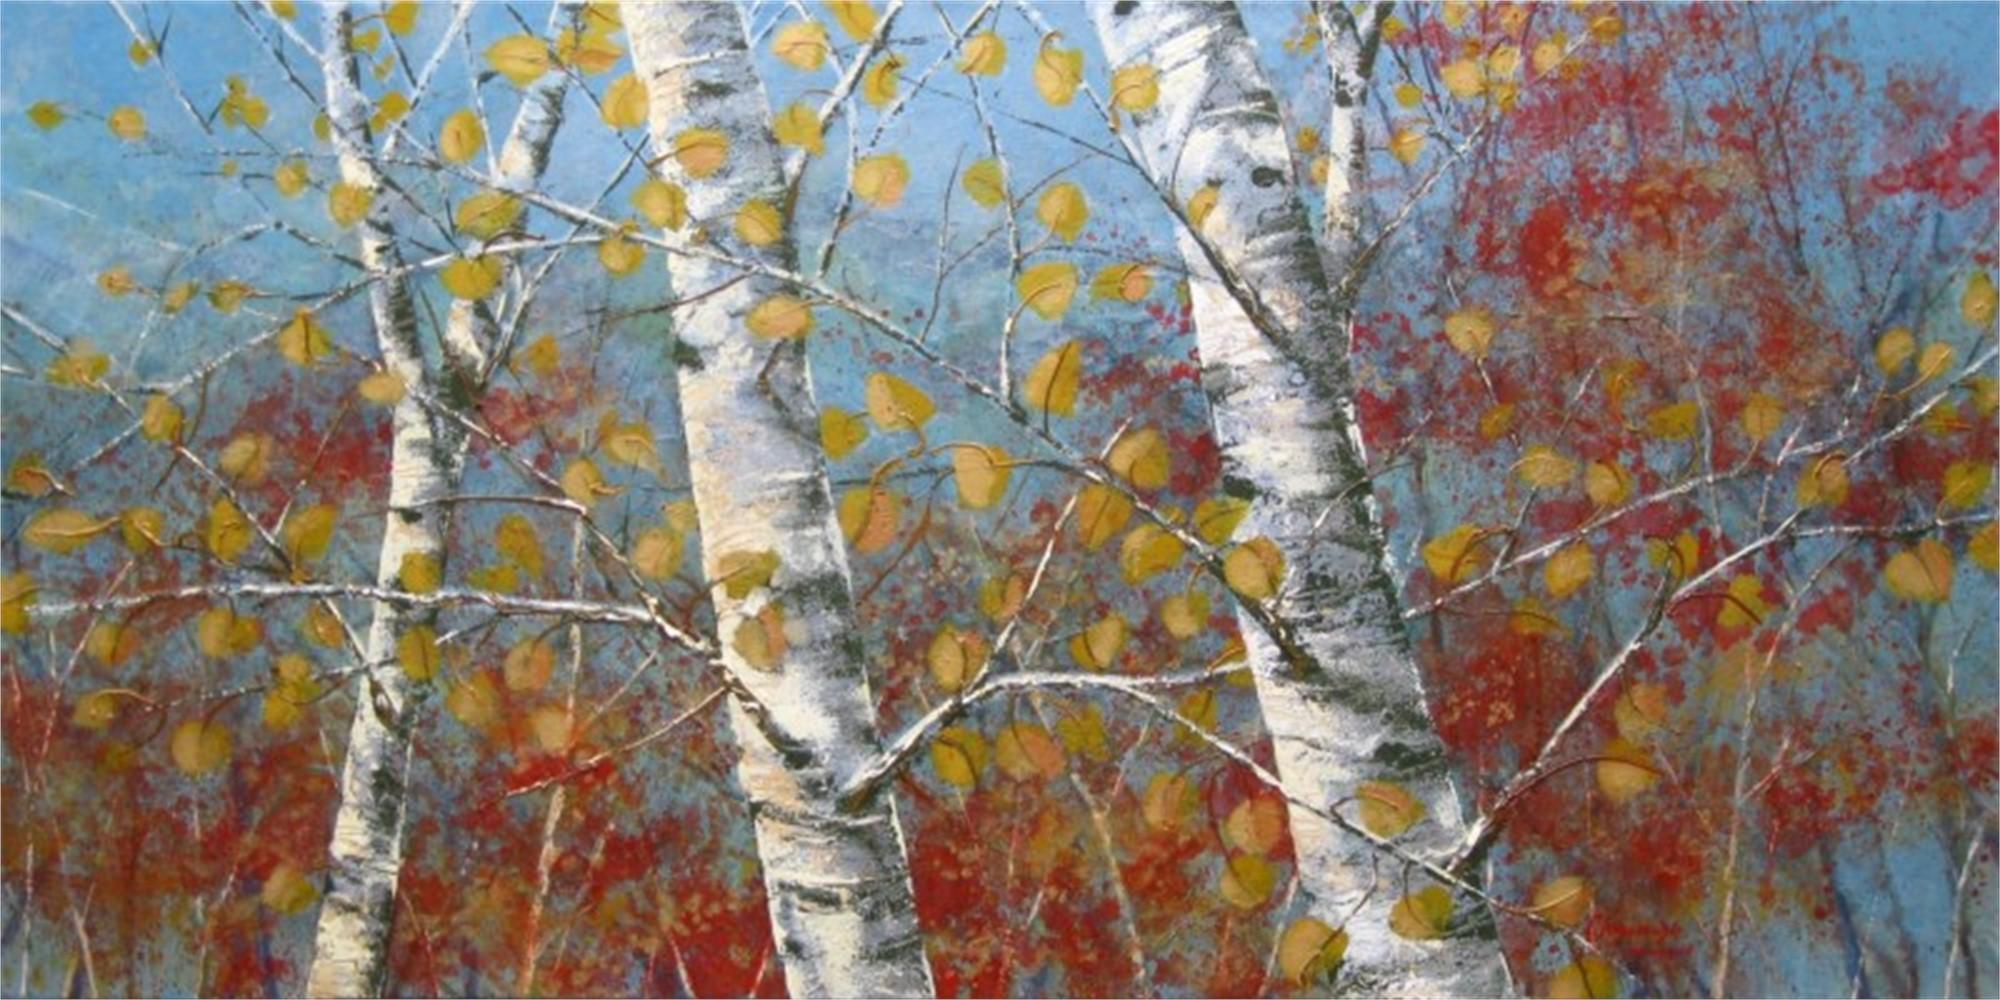 Morning Gold by Bob Chrzanowski